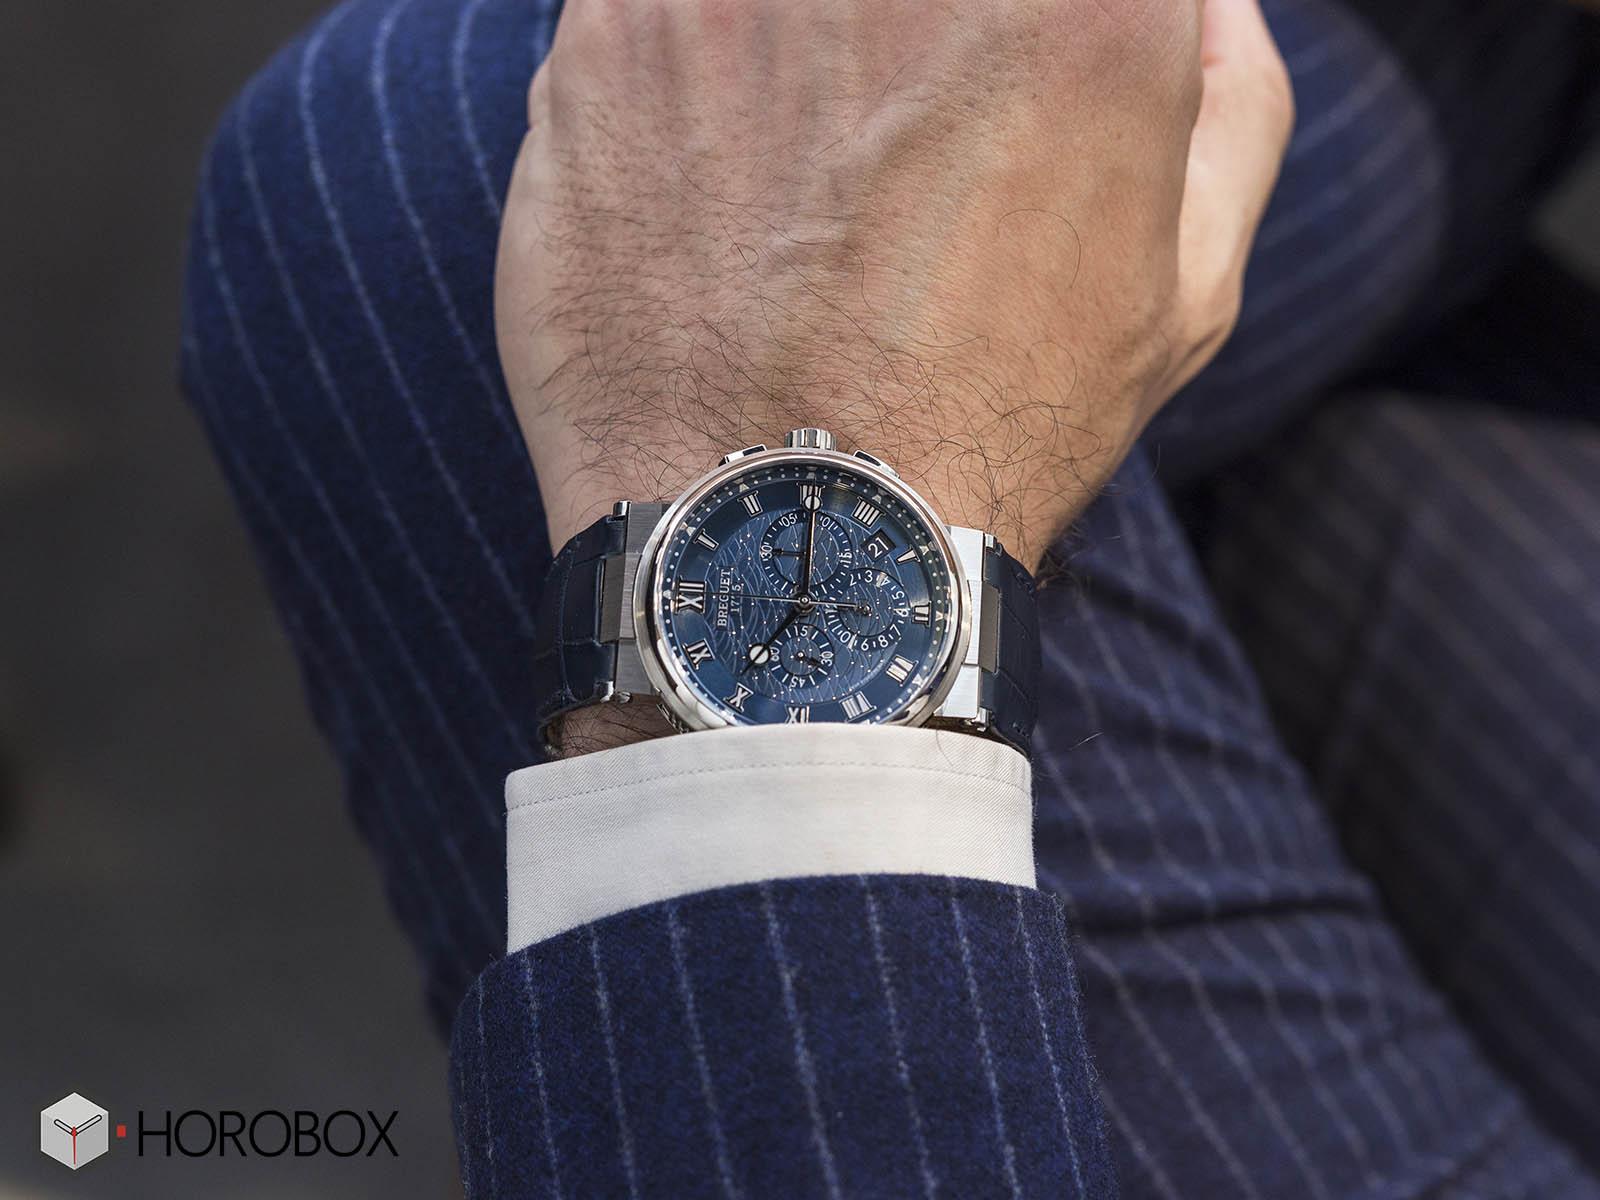 5527-breguet-marine-chronograph-9.jpg